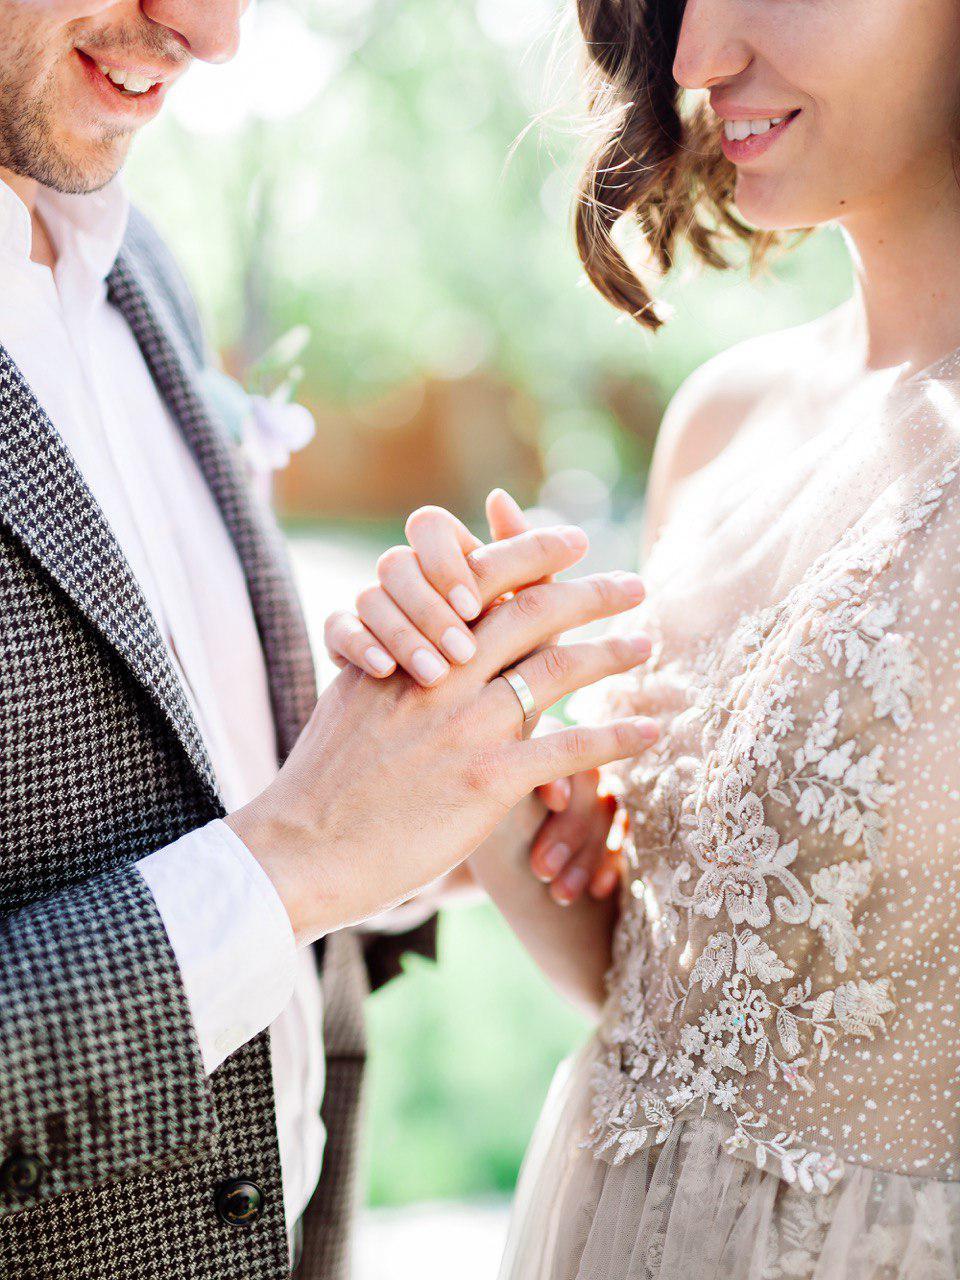 Франция свадебная церемония